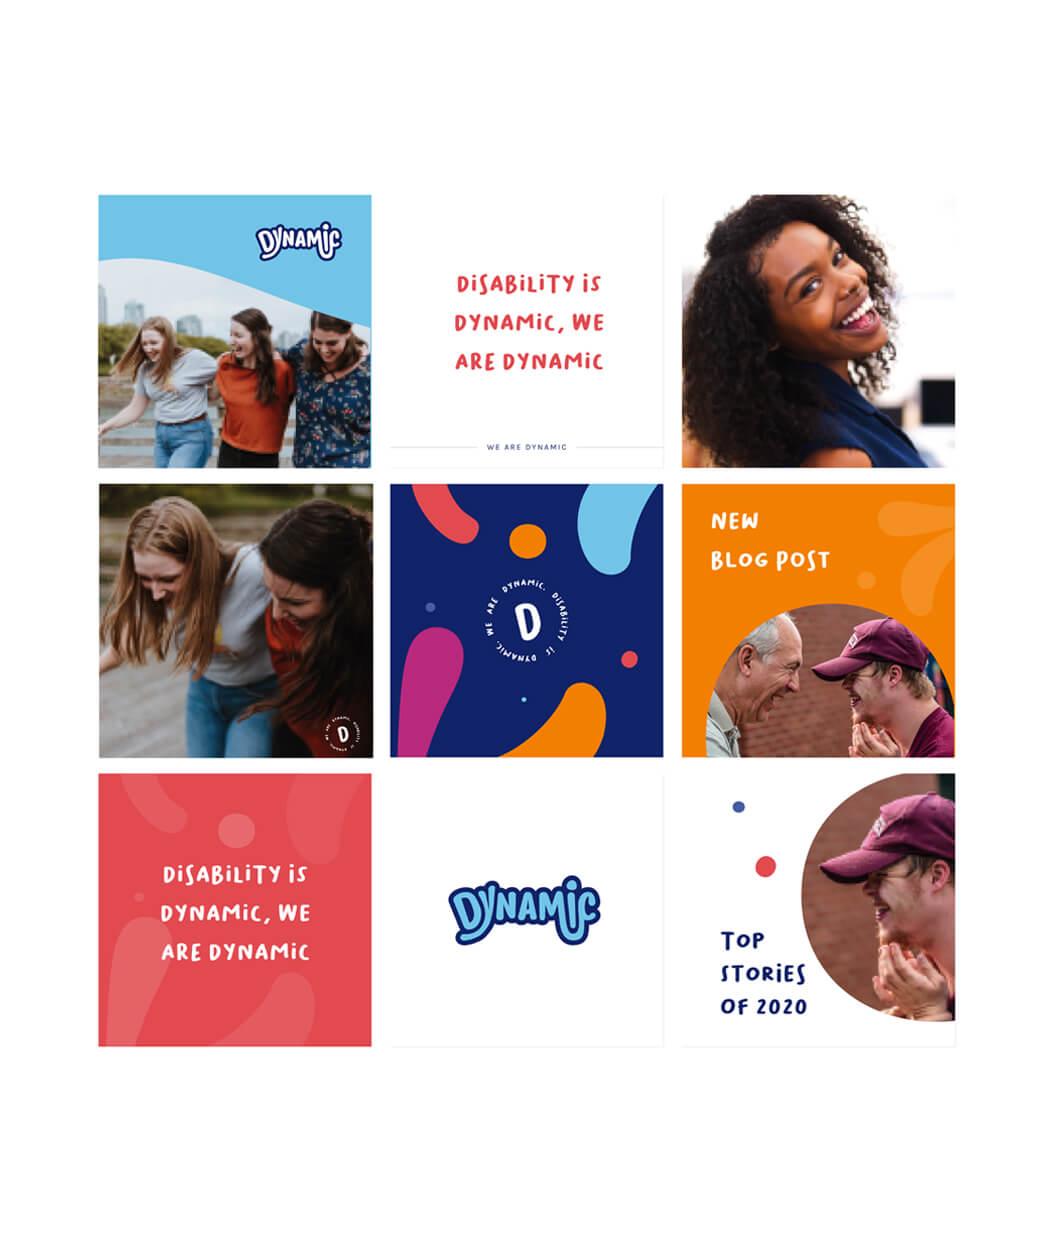 Instagram social media brand design